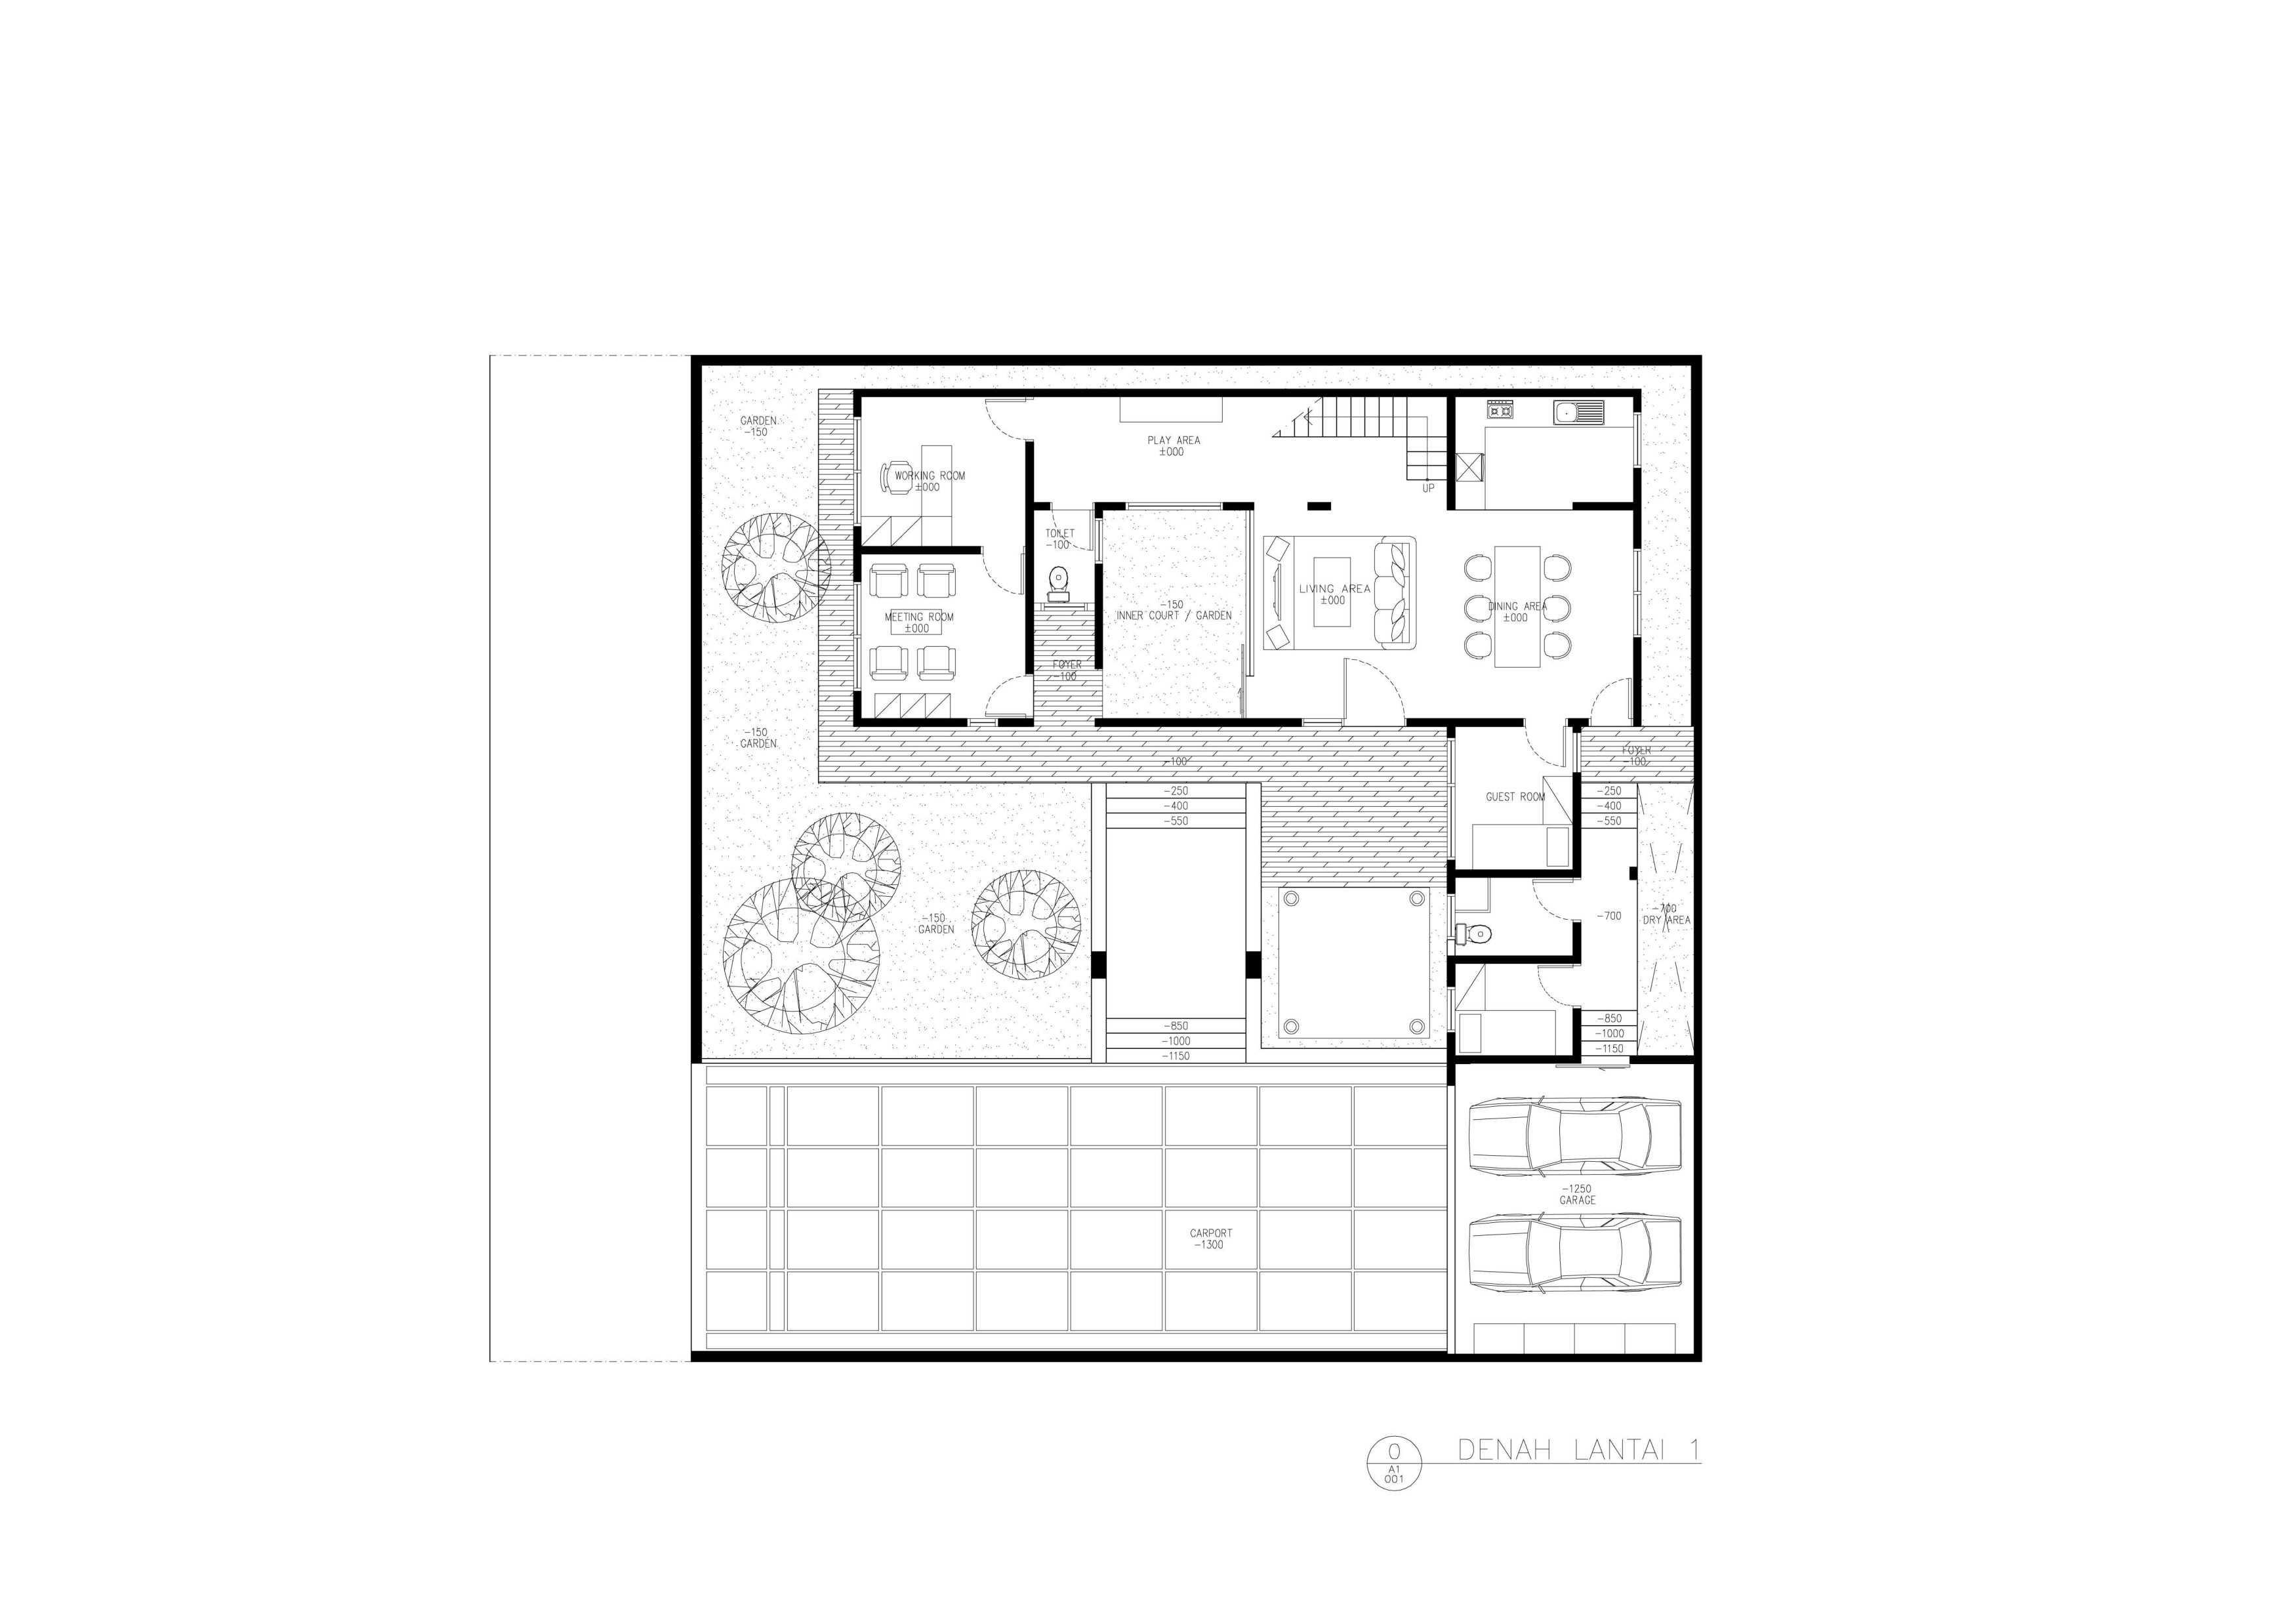 Amorta Design Studio Rumah F Manokwari Manokwari Denah-Rumah-F-01   29373